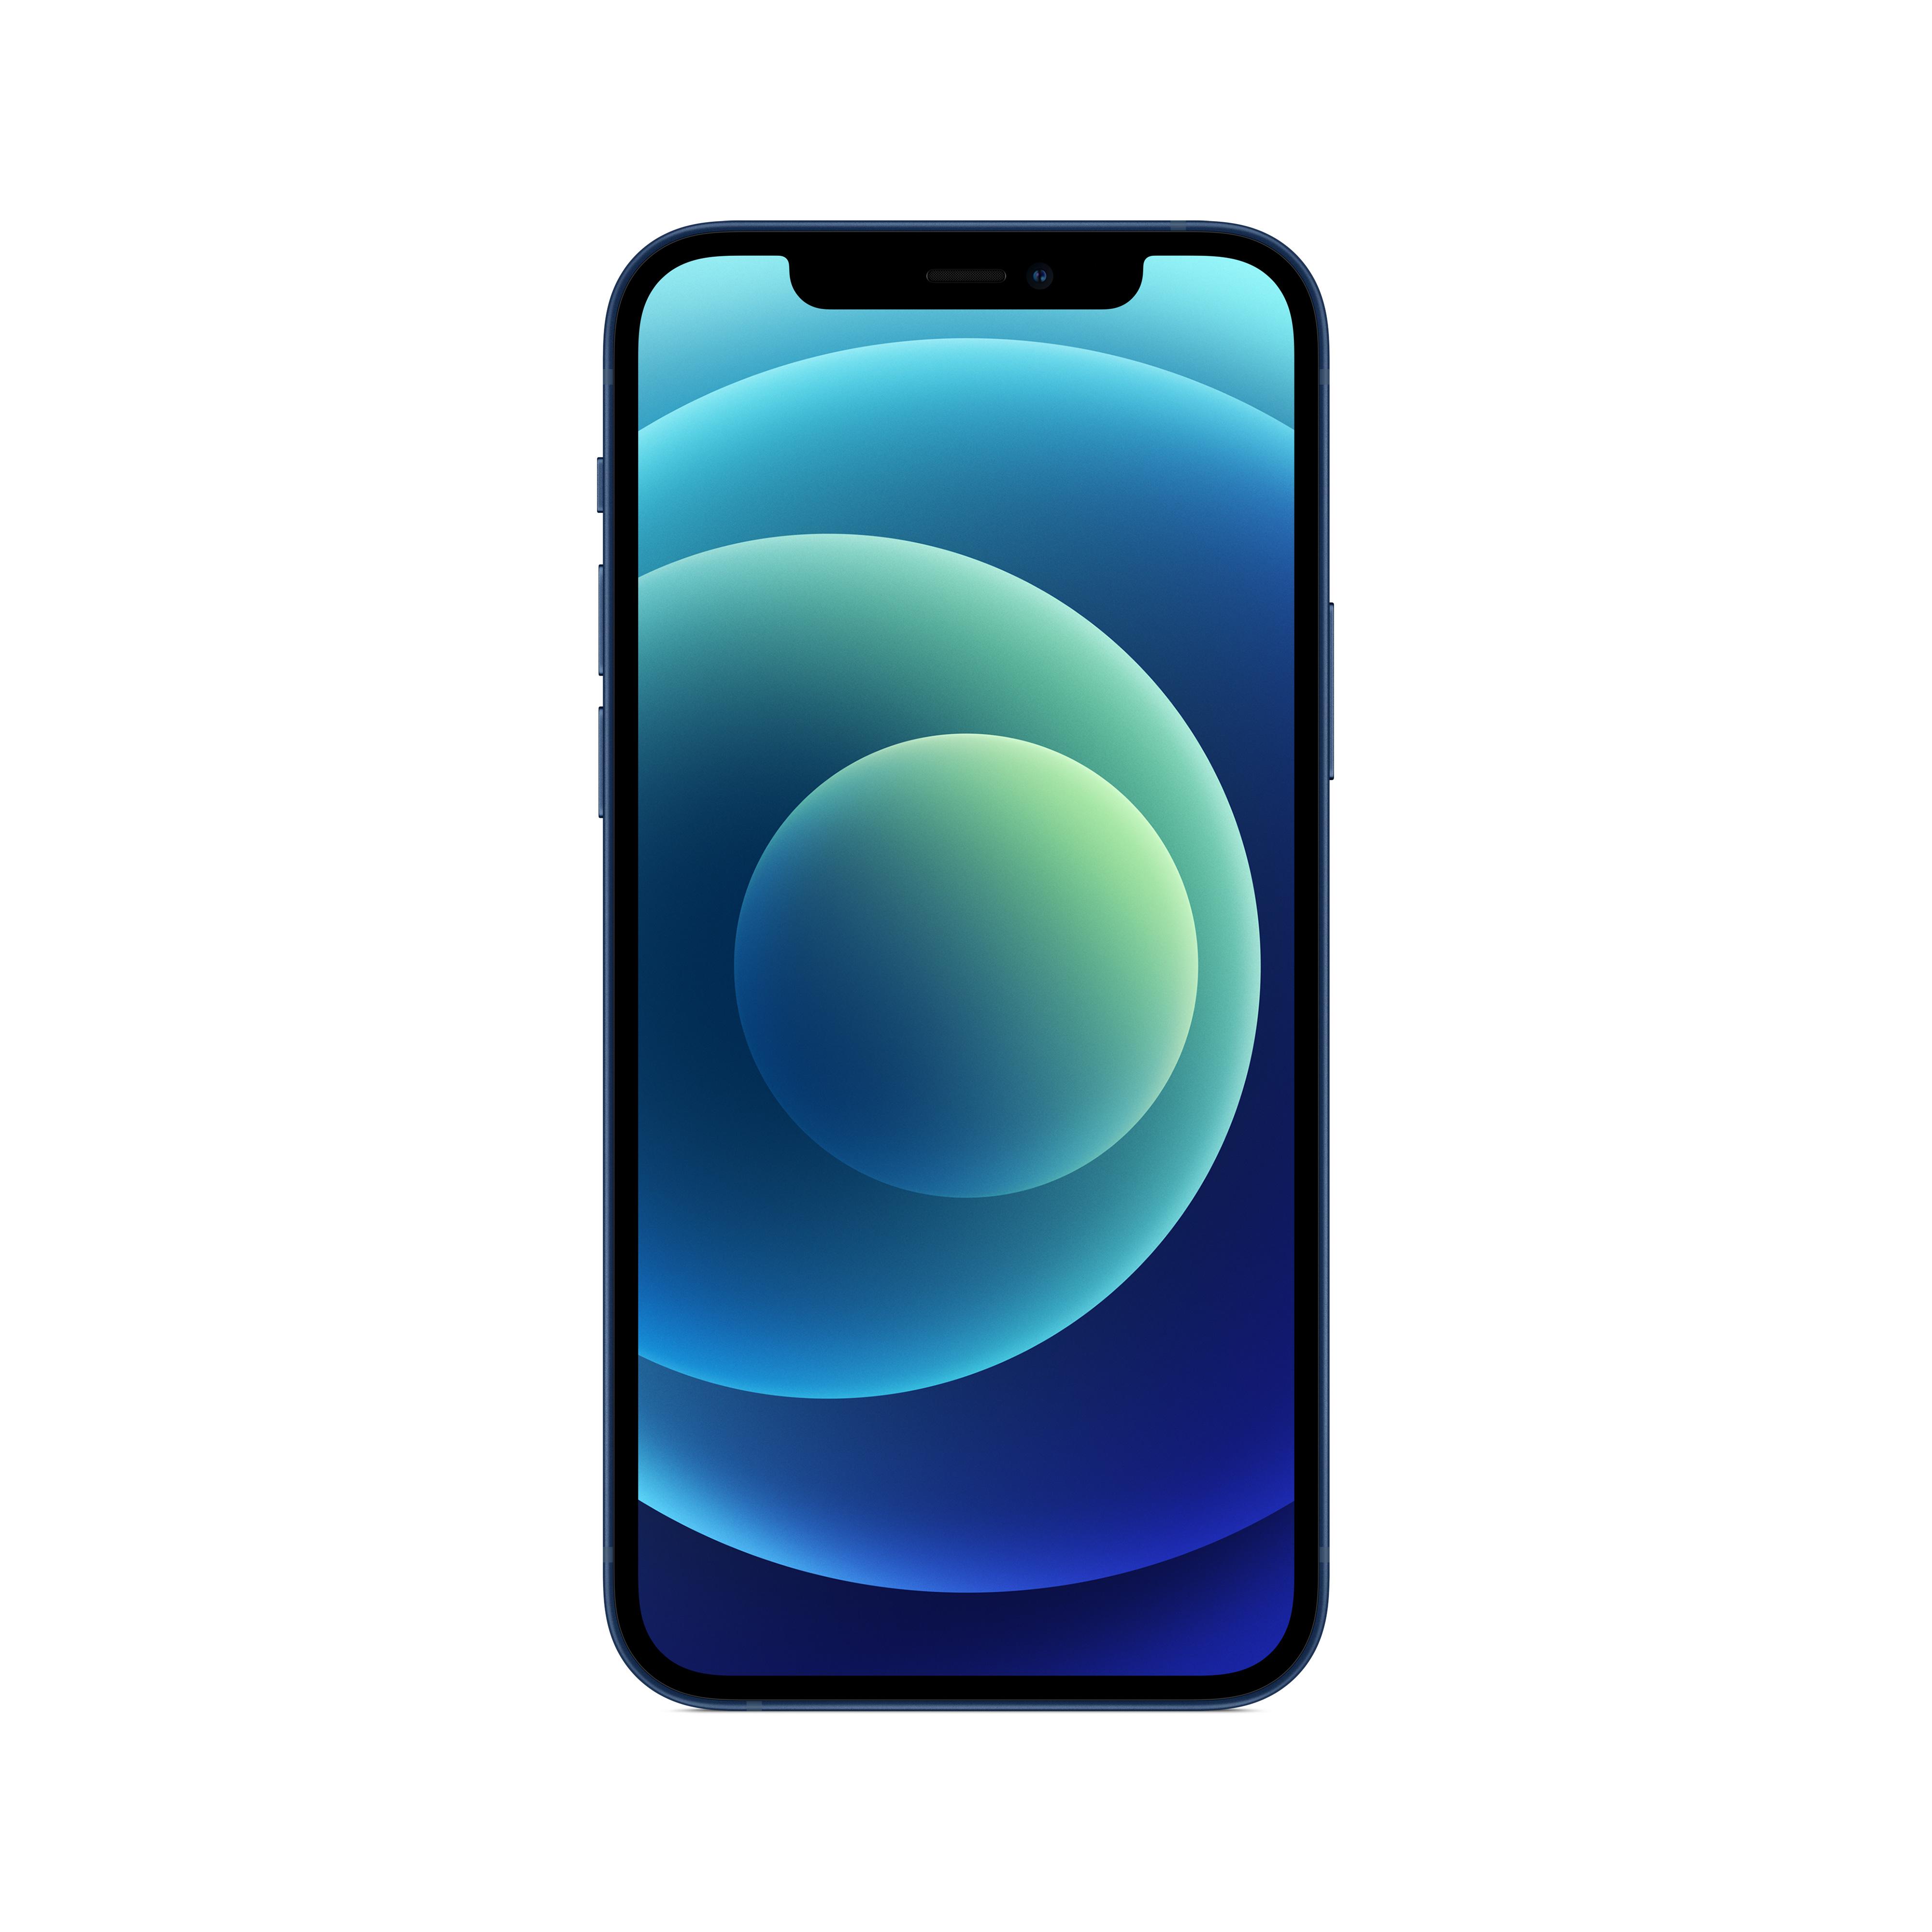 Apple - Iphone 12 64gb Blue